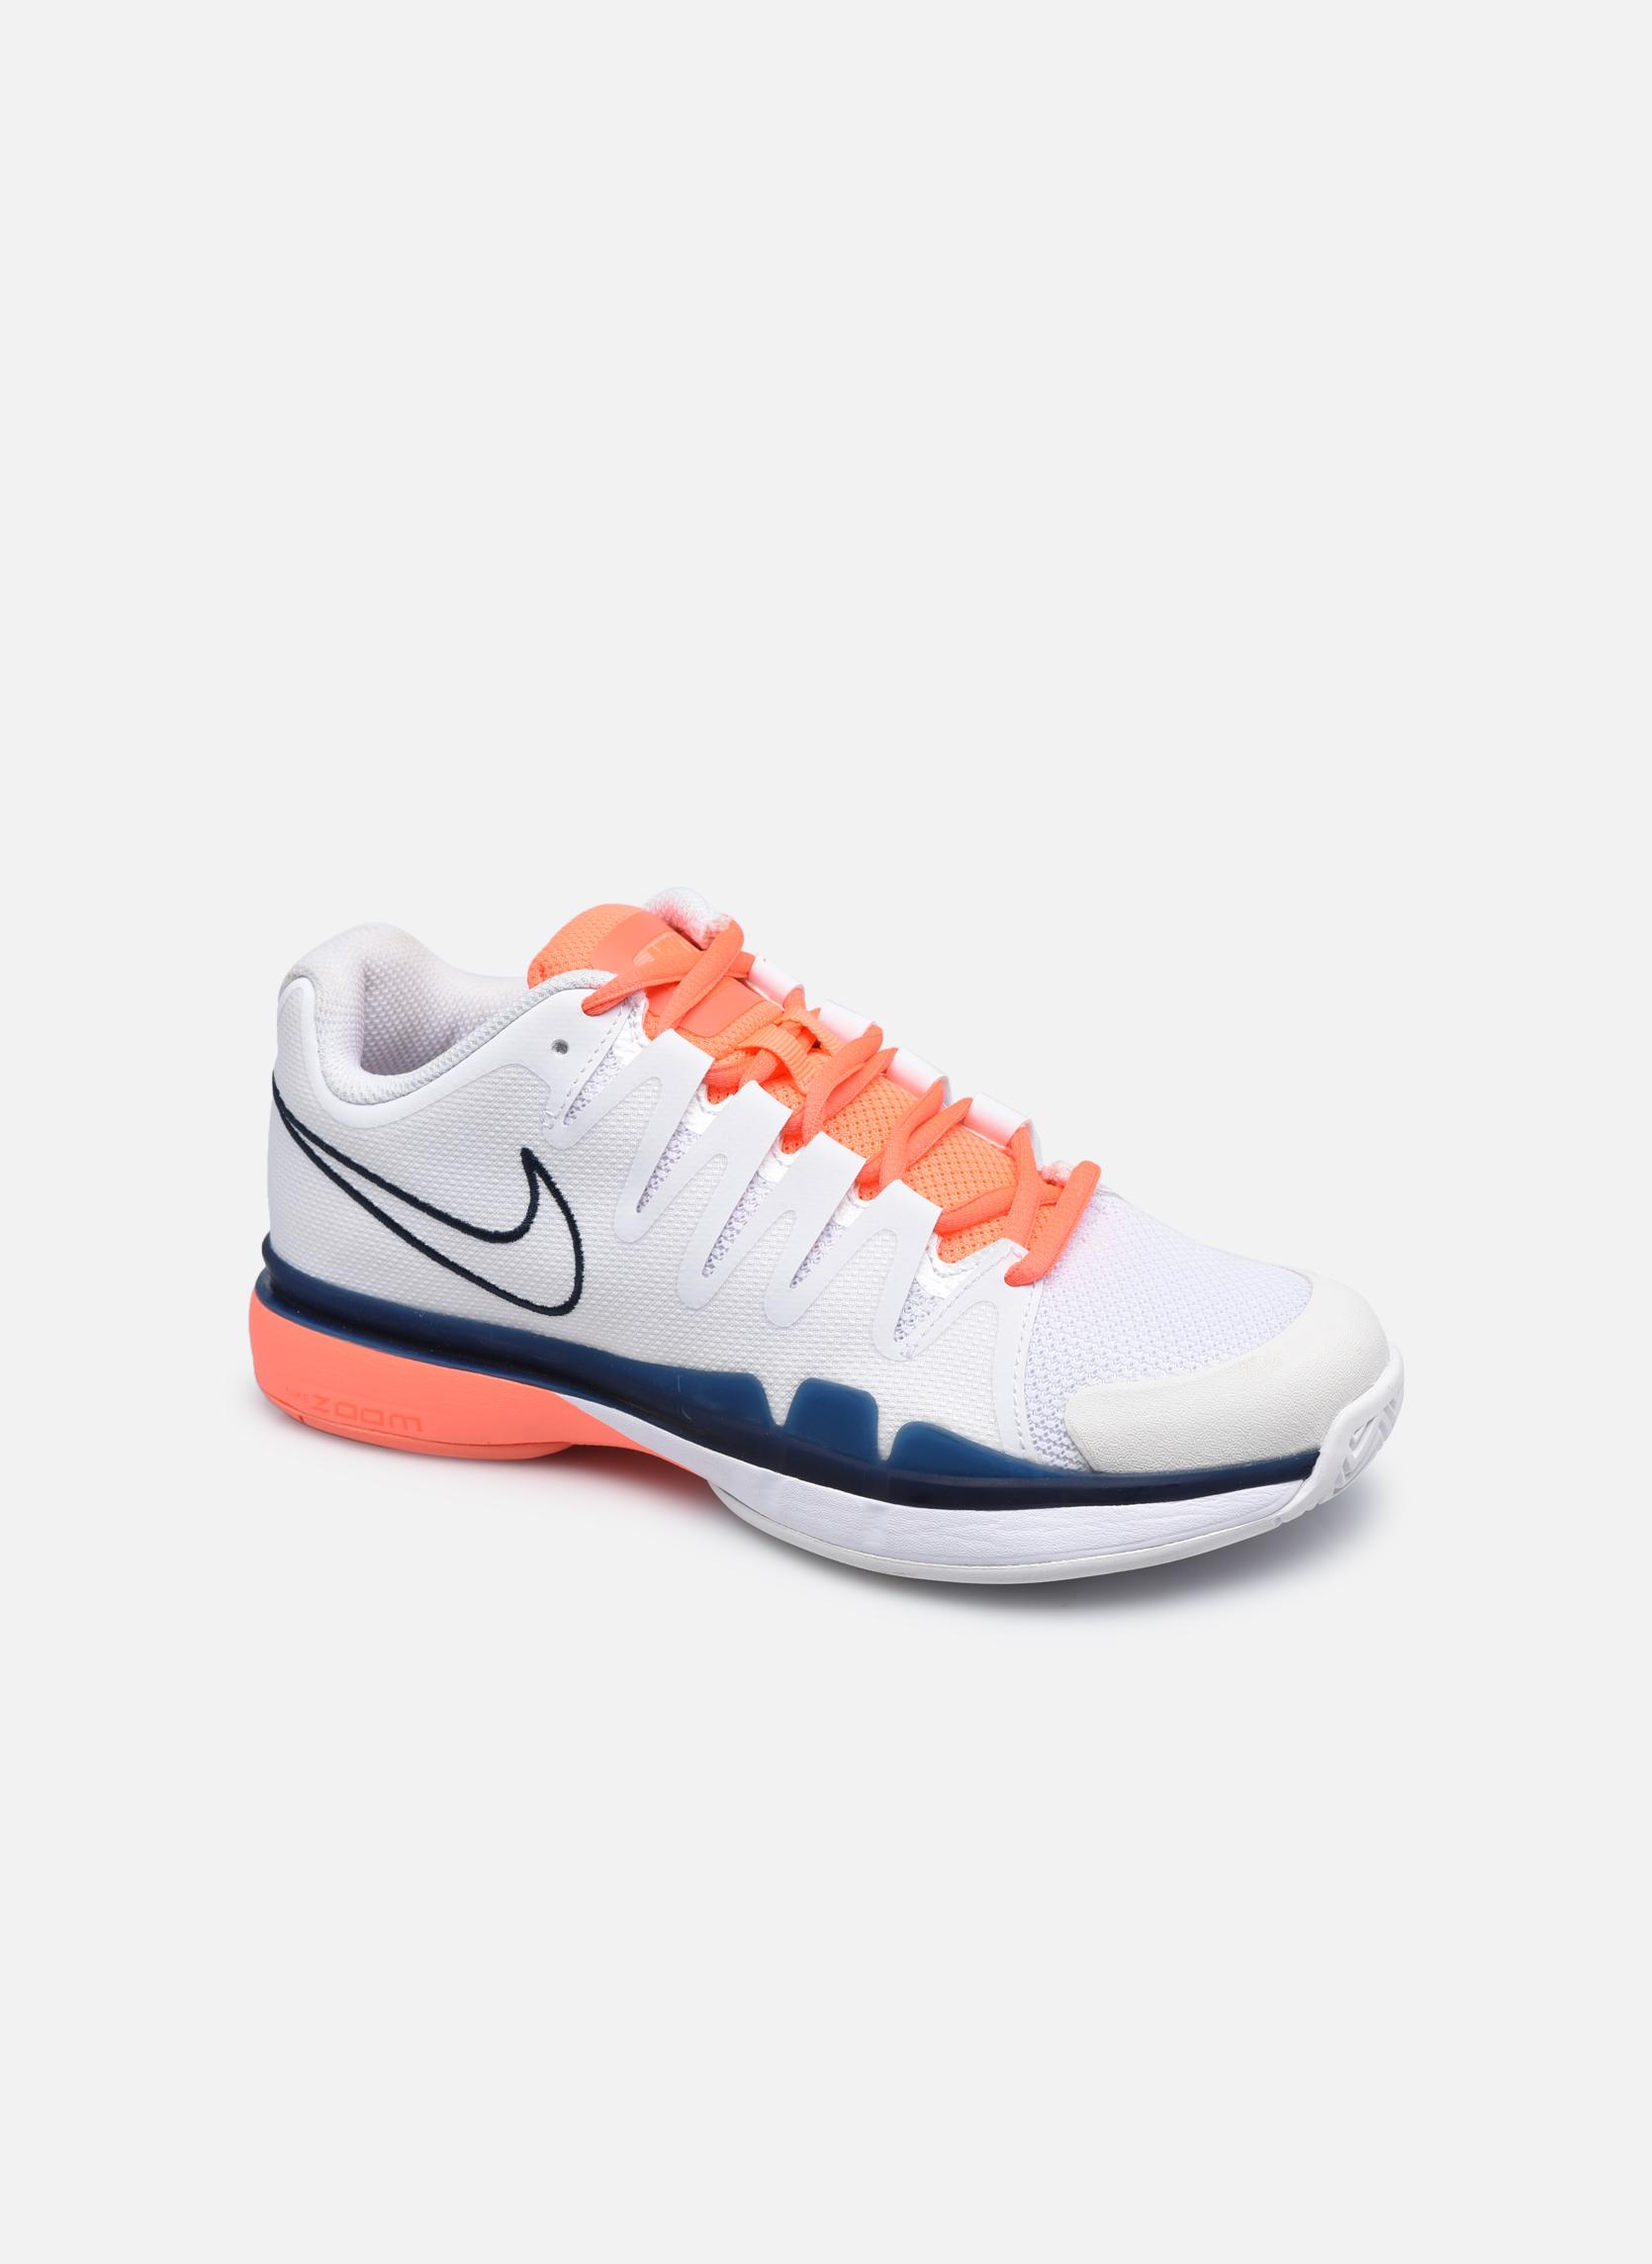 Nike Nike Zoom Vapor 9.5 Tour